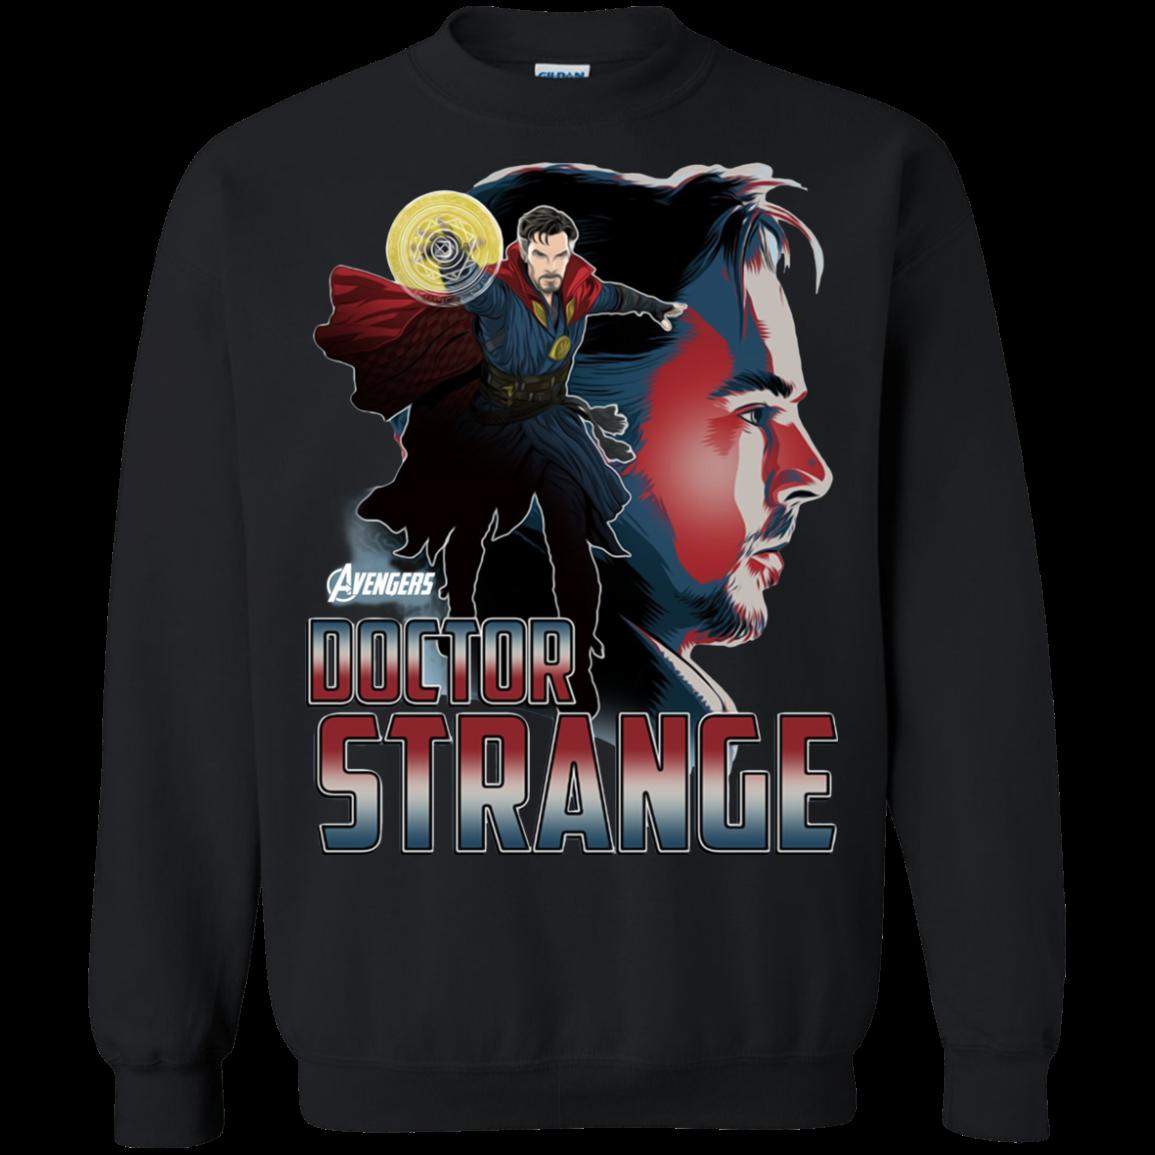 Avengers Infinity War Doctor Strange Head T shirt Hoodie Sweater SweatShirt